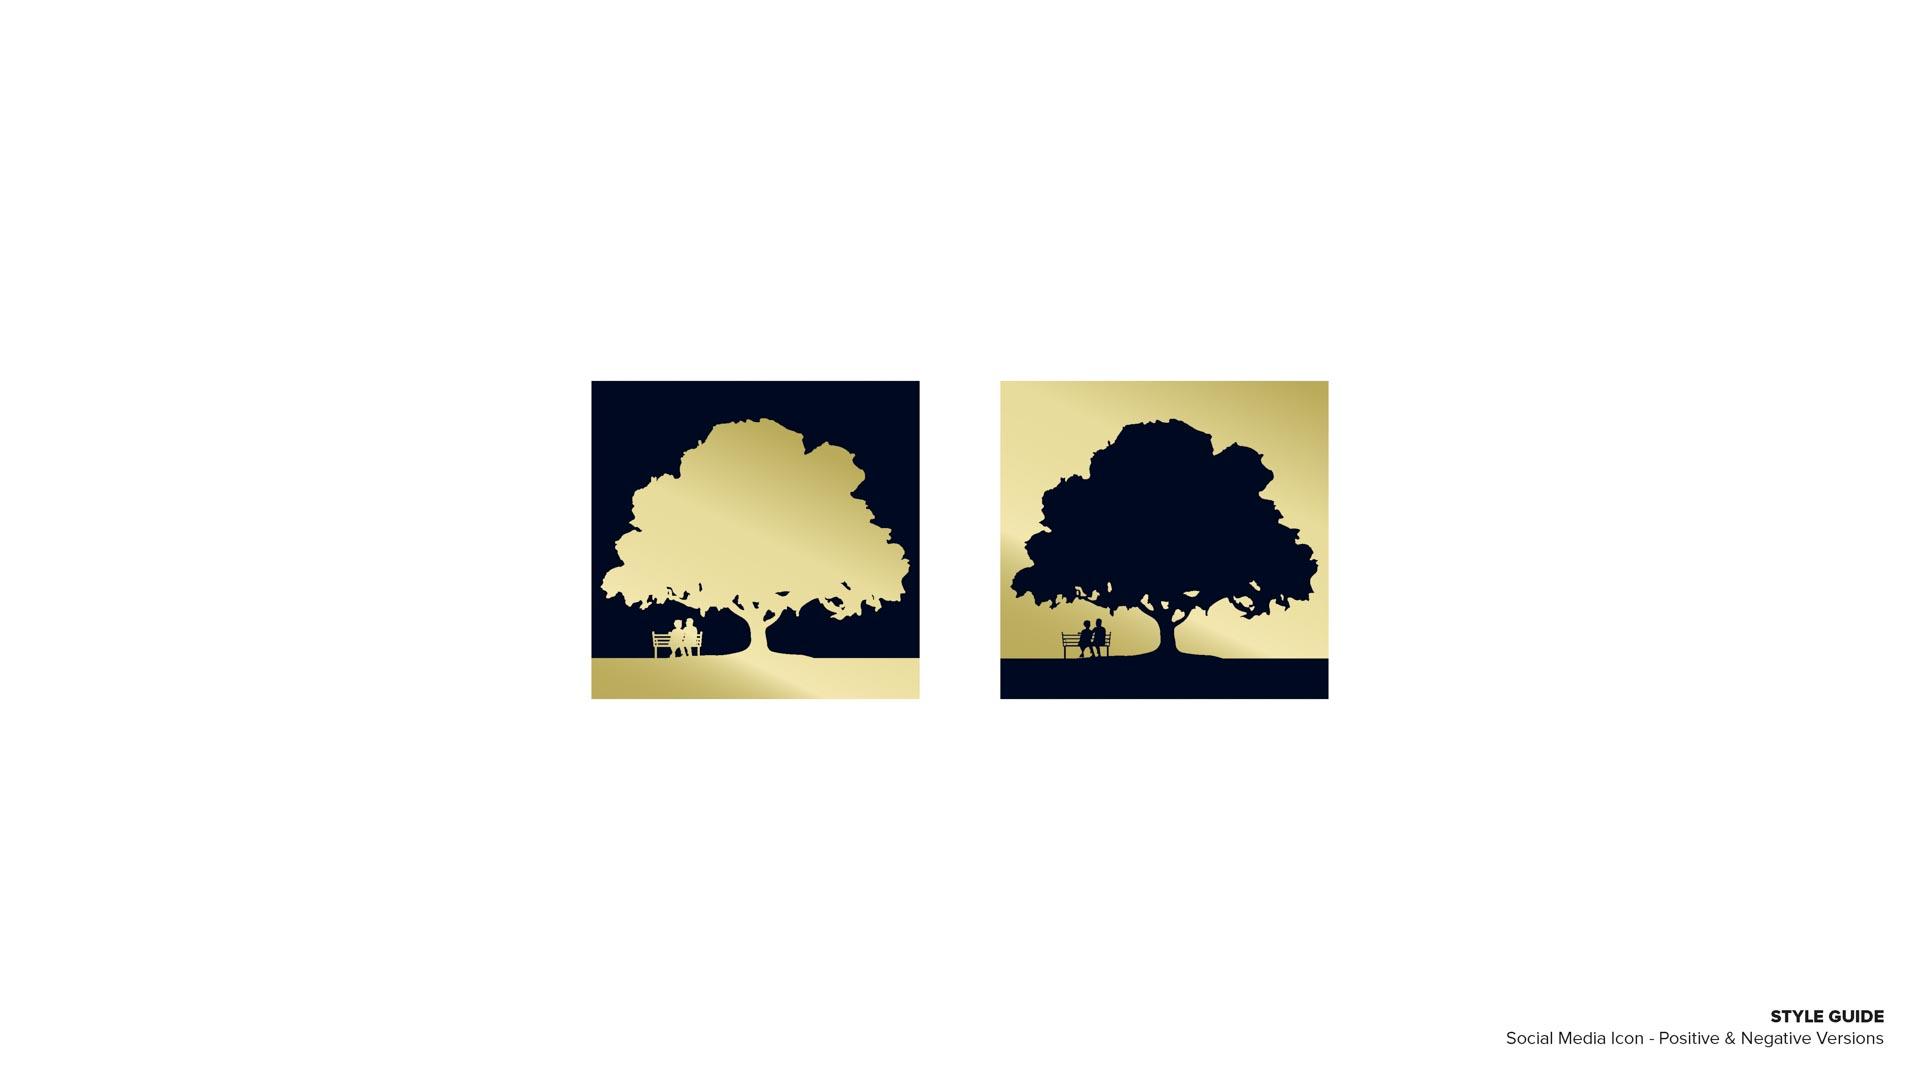 Holy Cross Village's Social Media Icon - Positive & Negative Versions